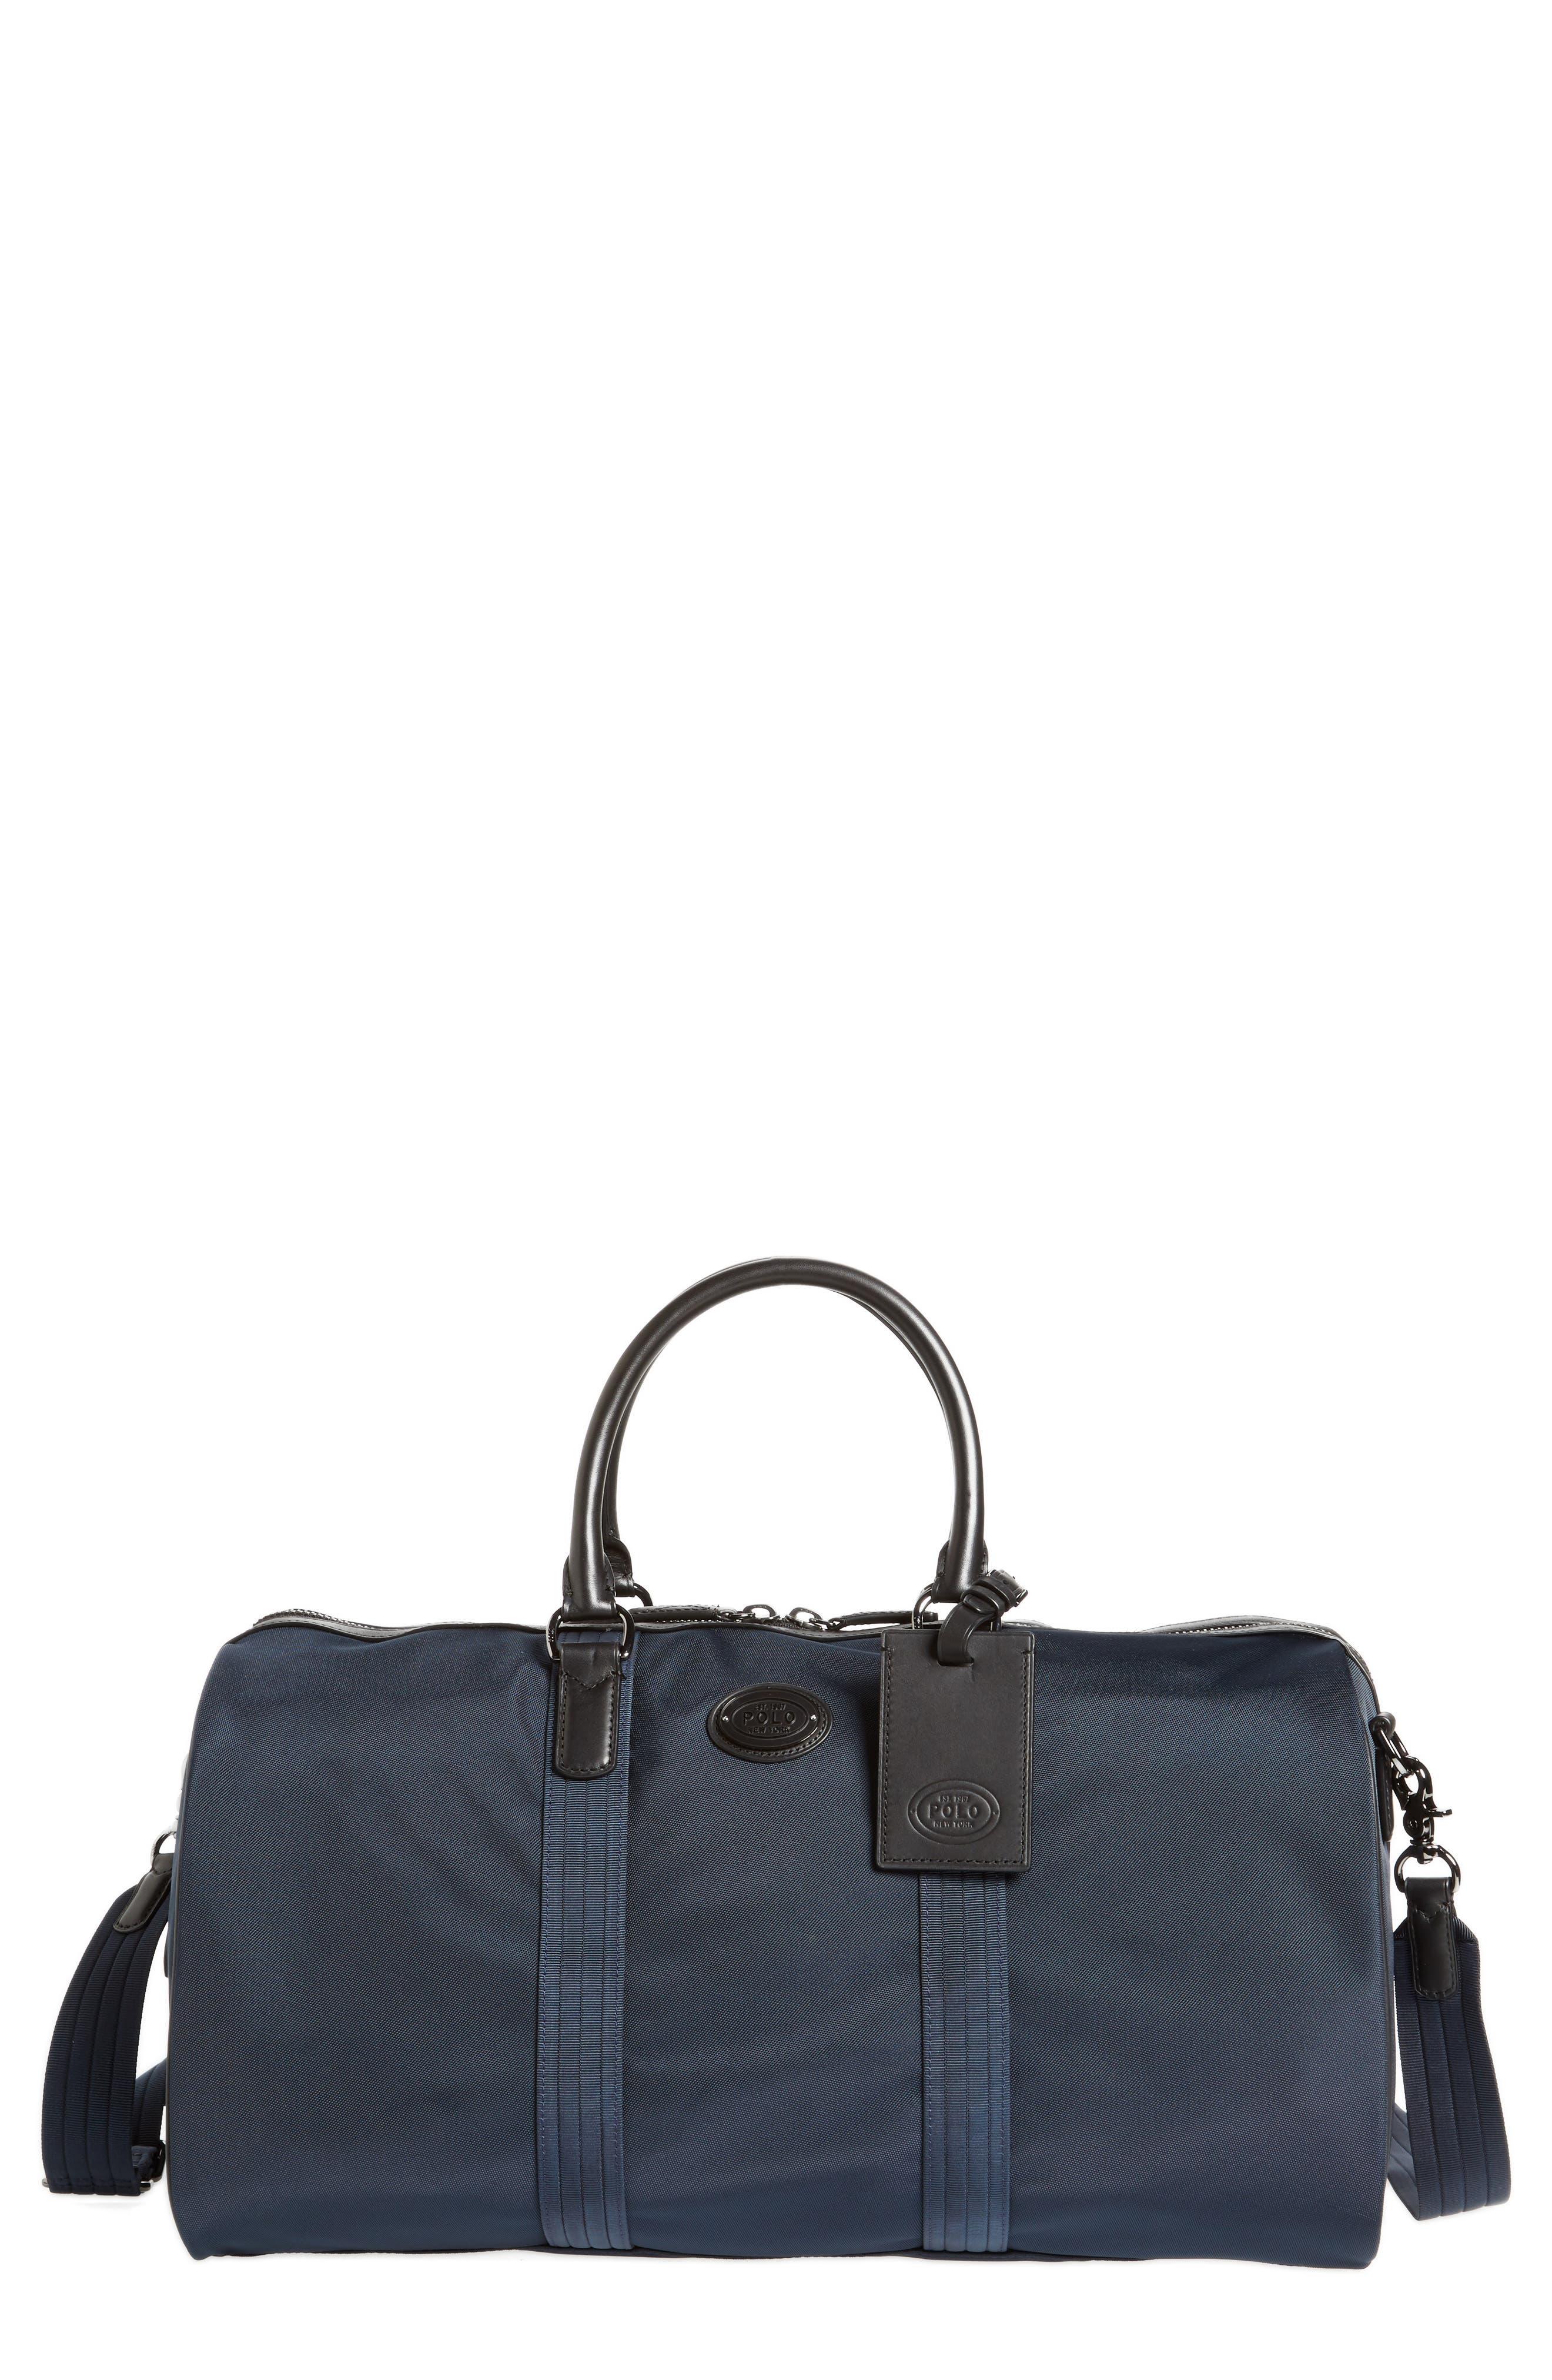 Main Image - Polo Ralph Lauren Thompson Duffel Bag